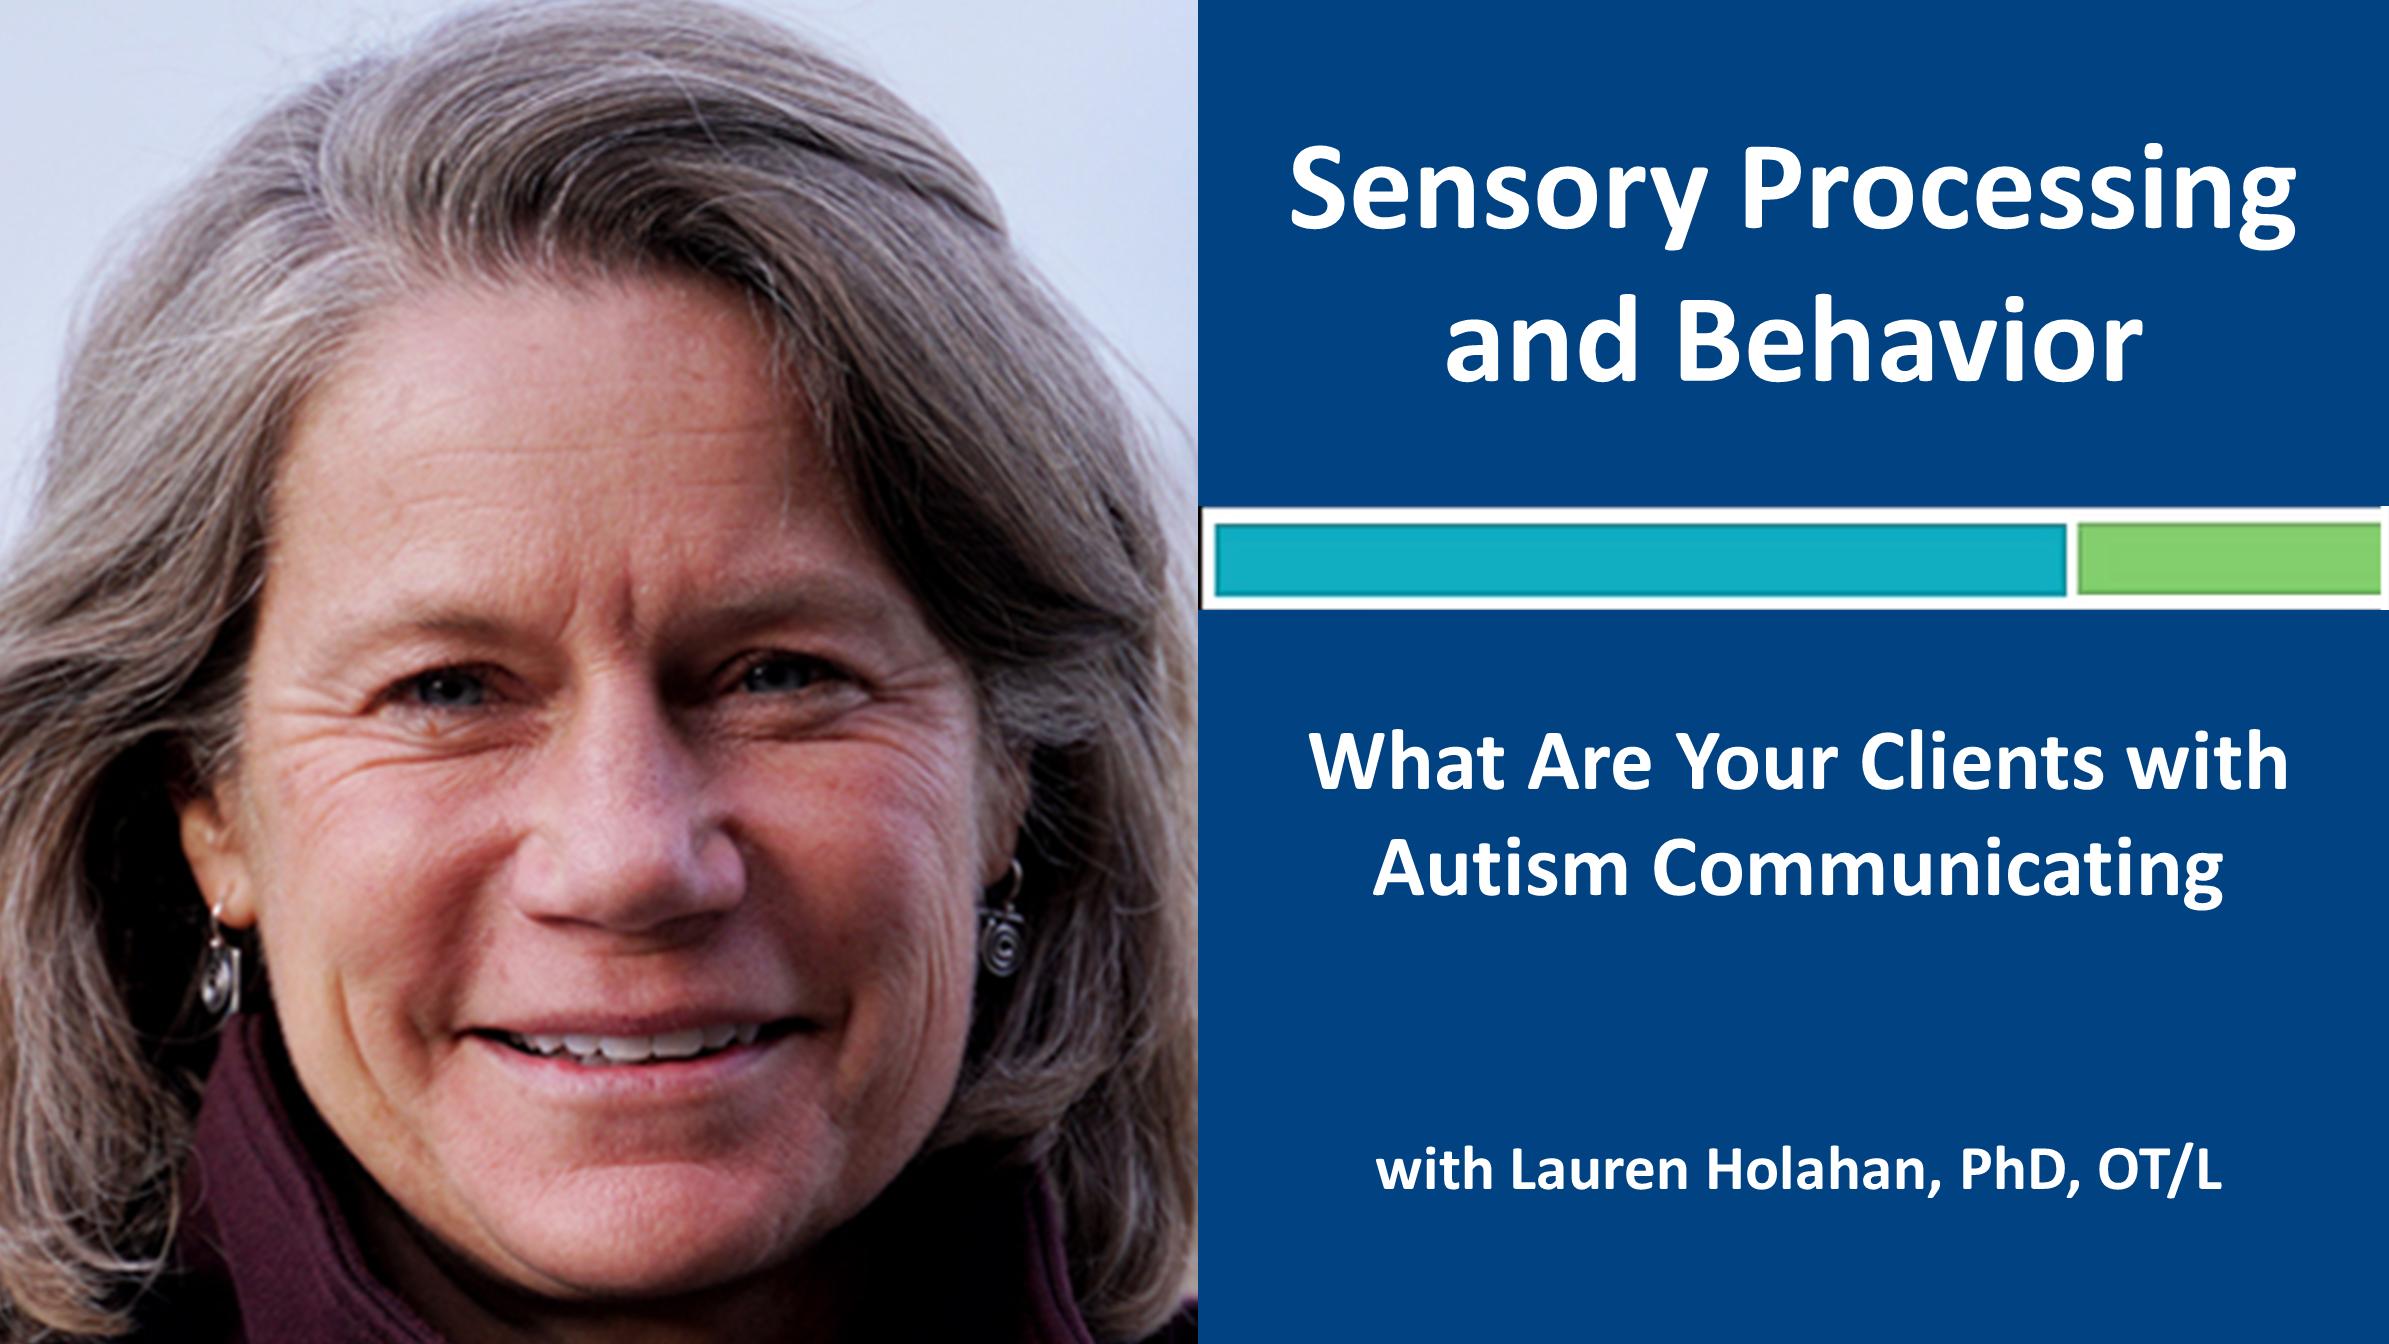 Webinar 2: Sensory Processing and Behavior with Lauren Holahan, PhD, OT/L